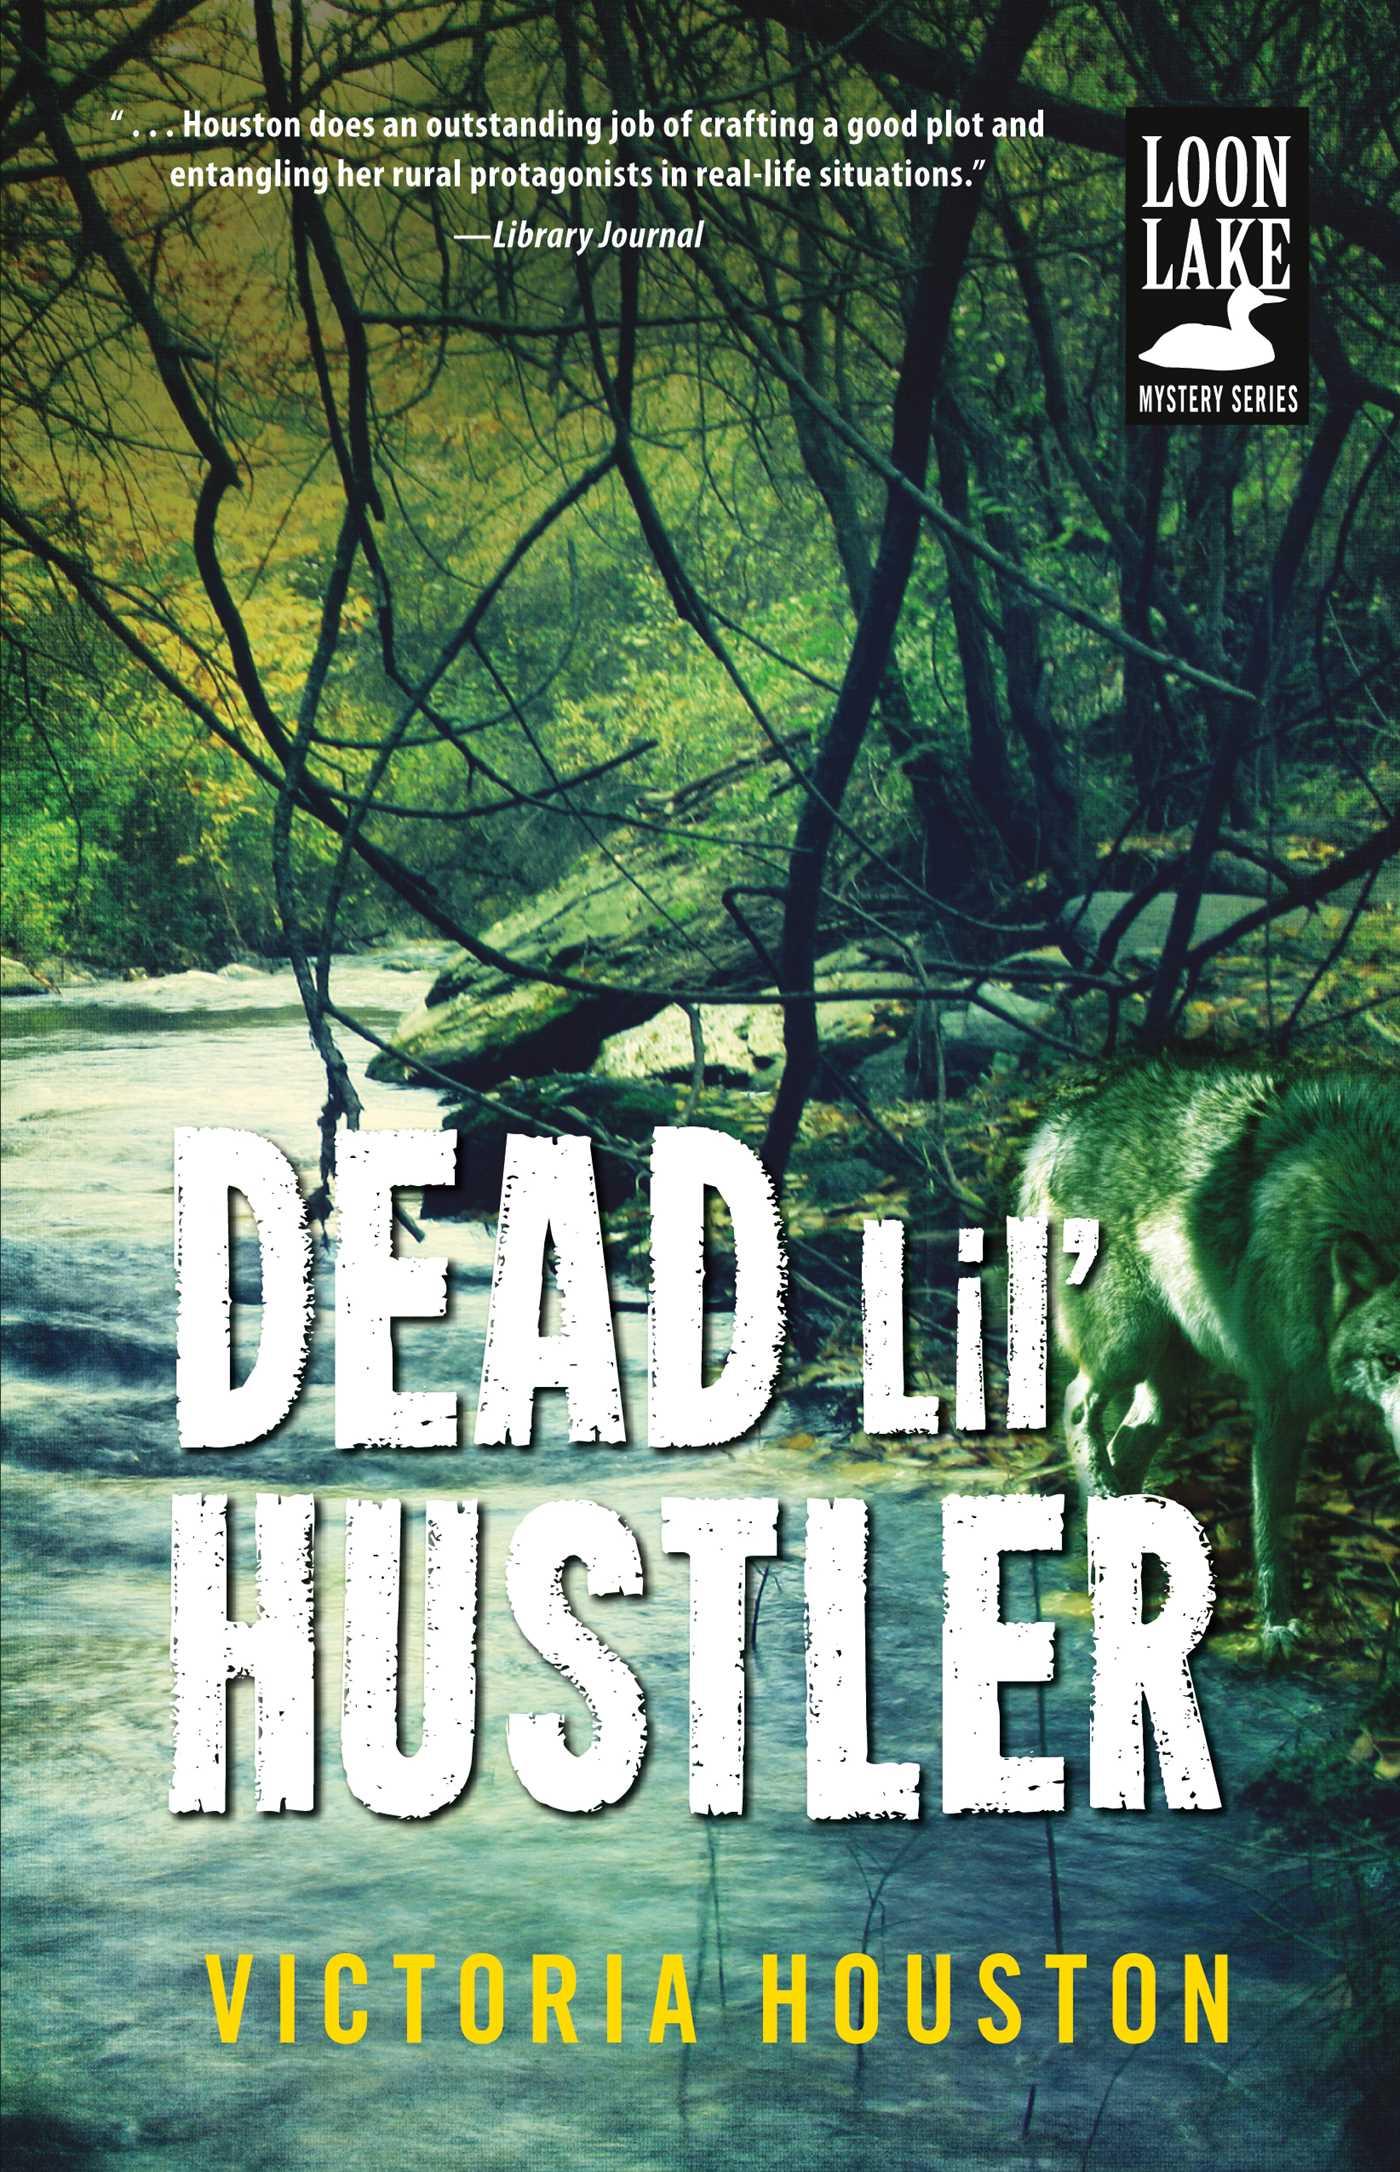 Dead lil hustler 9781440568404 hr